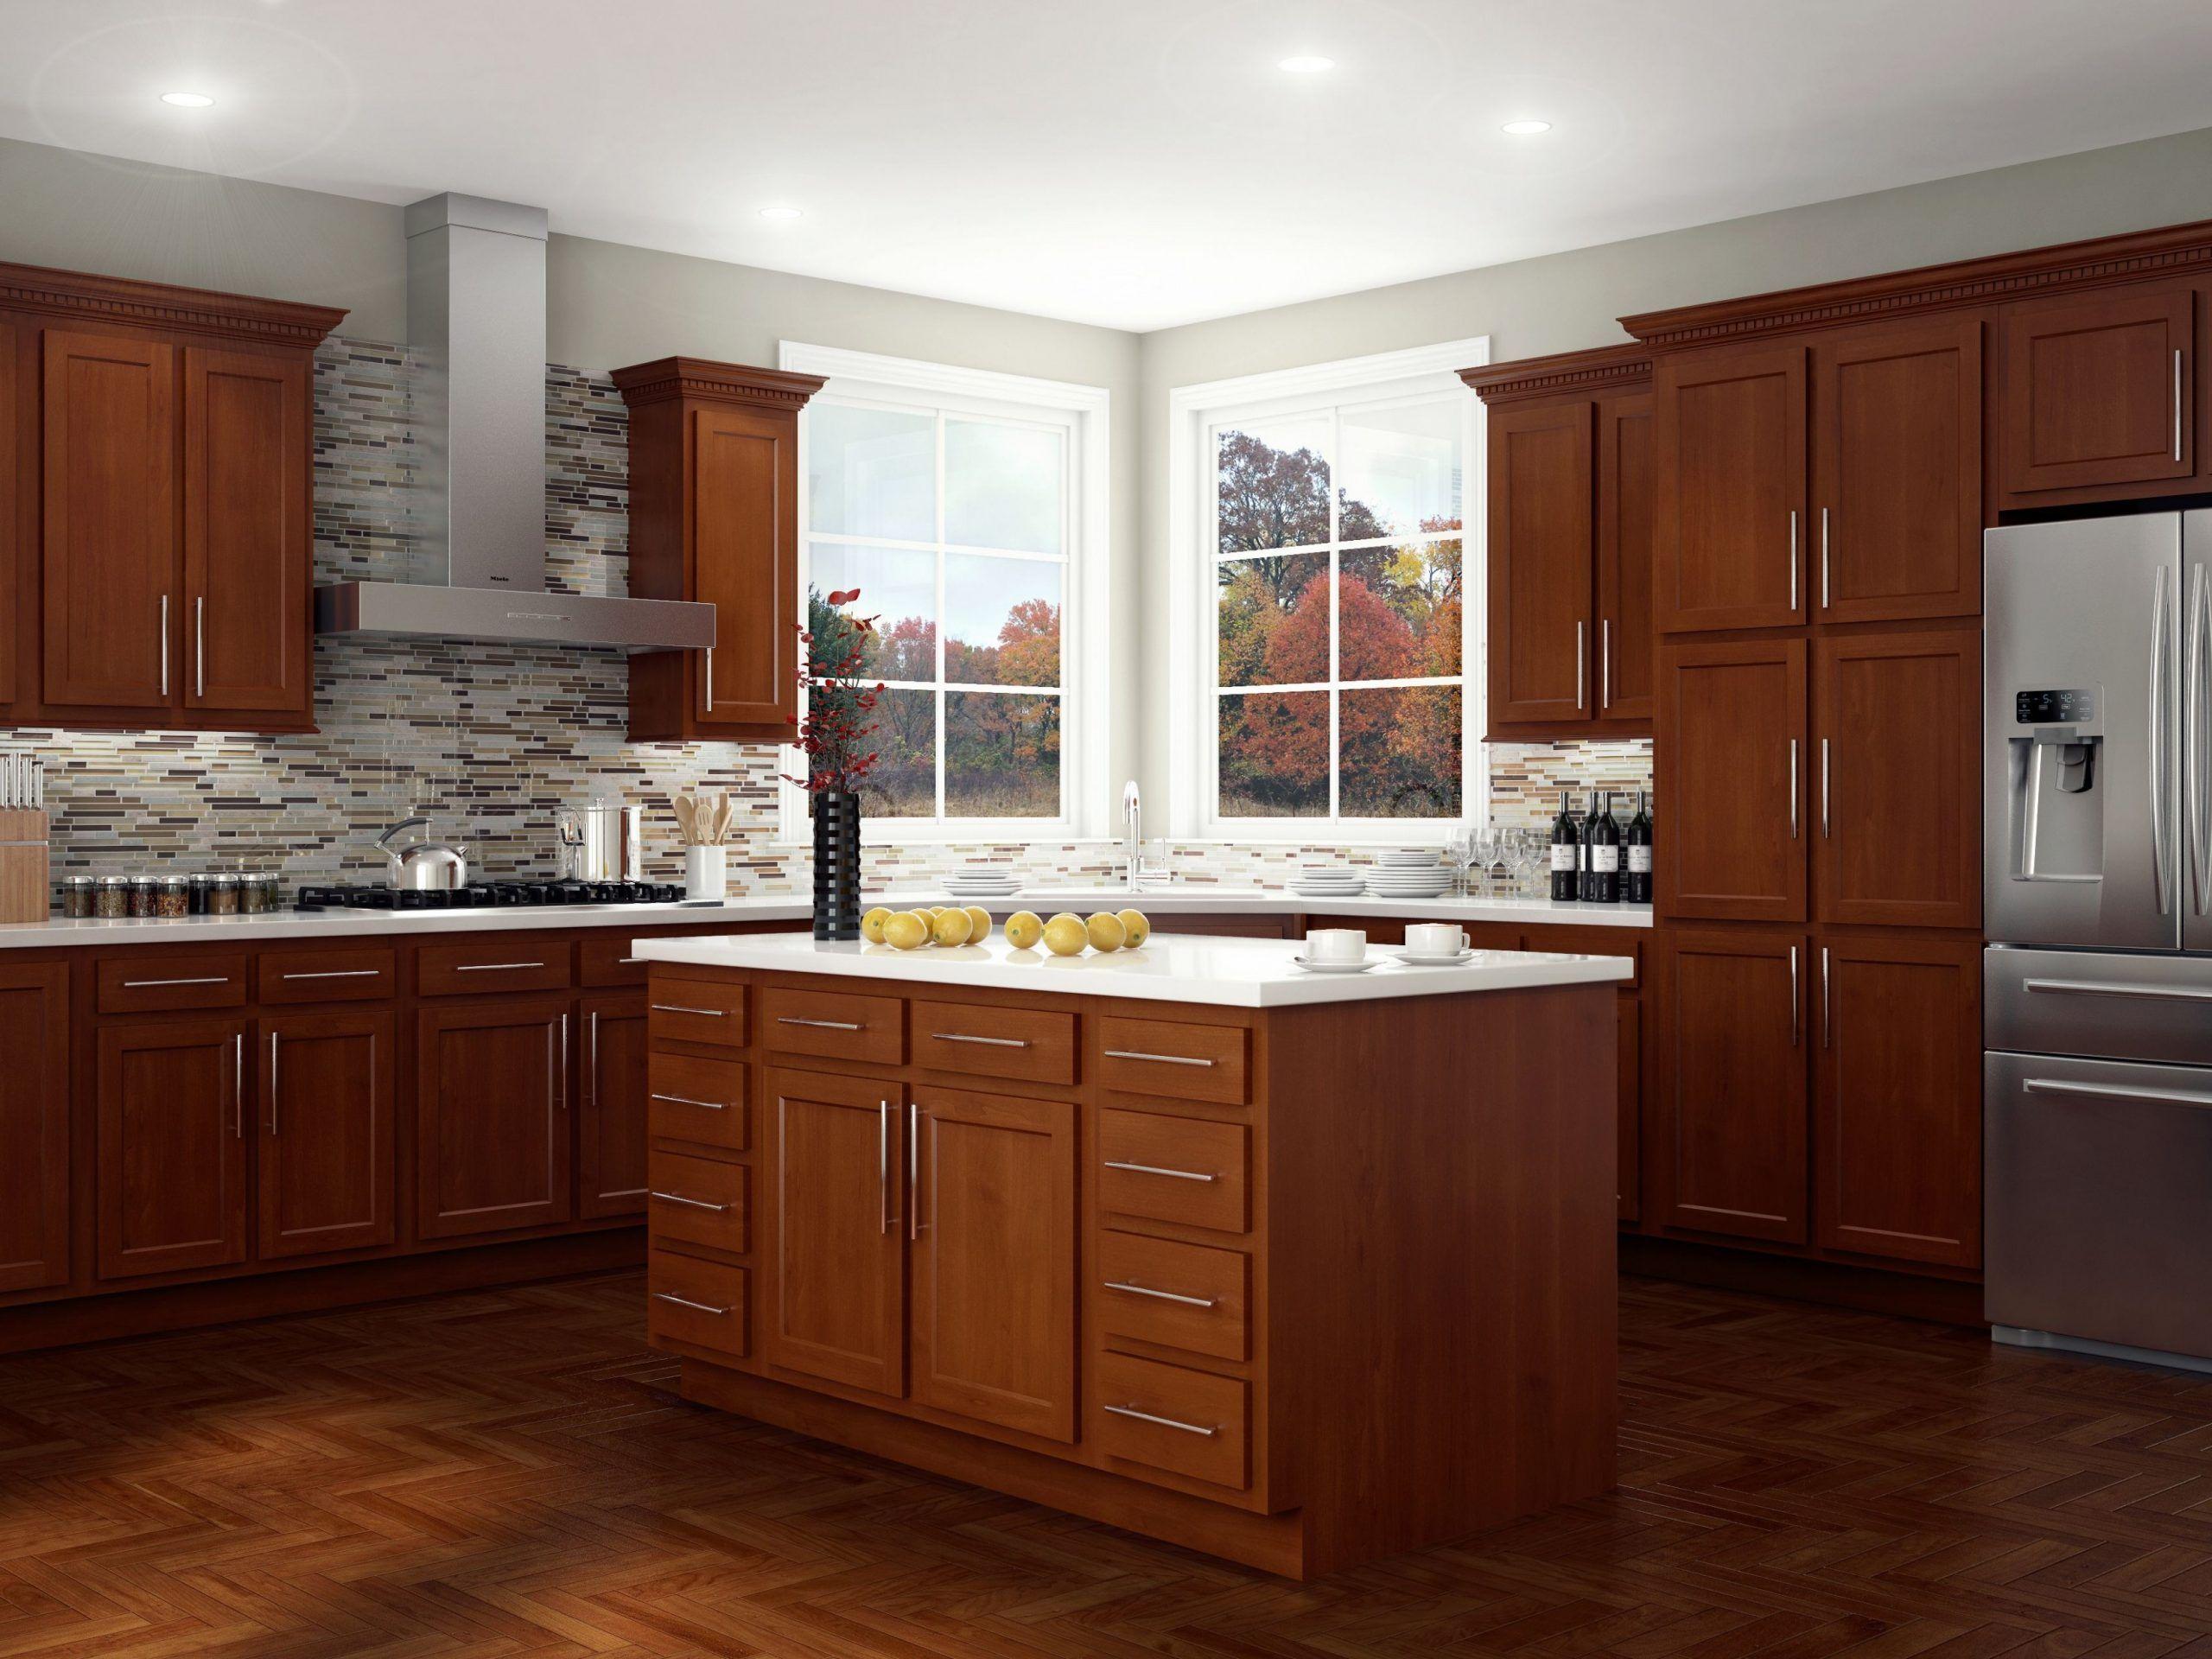 Menards Kitchen Kompact Cabinets In 2020 Menards Kitchen Cabinets Menards Kitchen Beech Kitchen